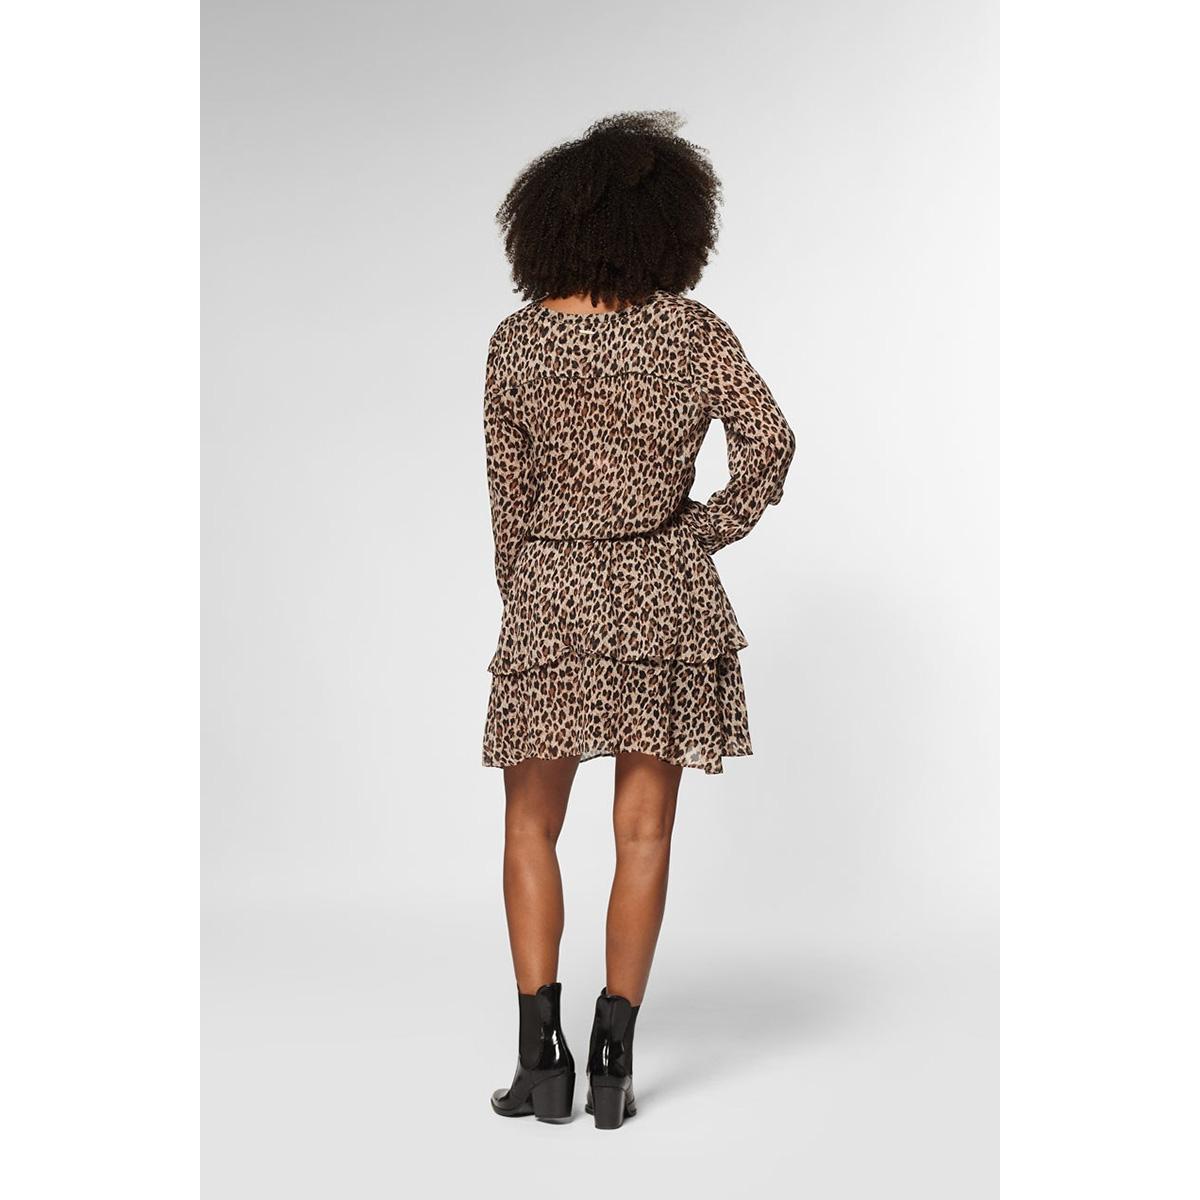 gaby dress longsleeve s20 108 7480 circle of trust jurk leopard